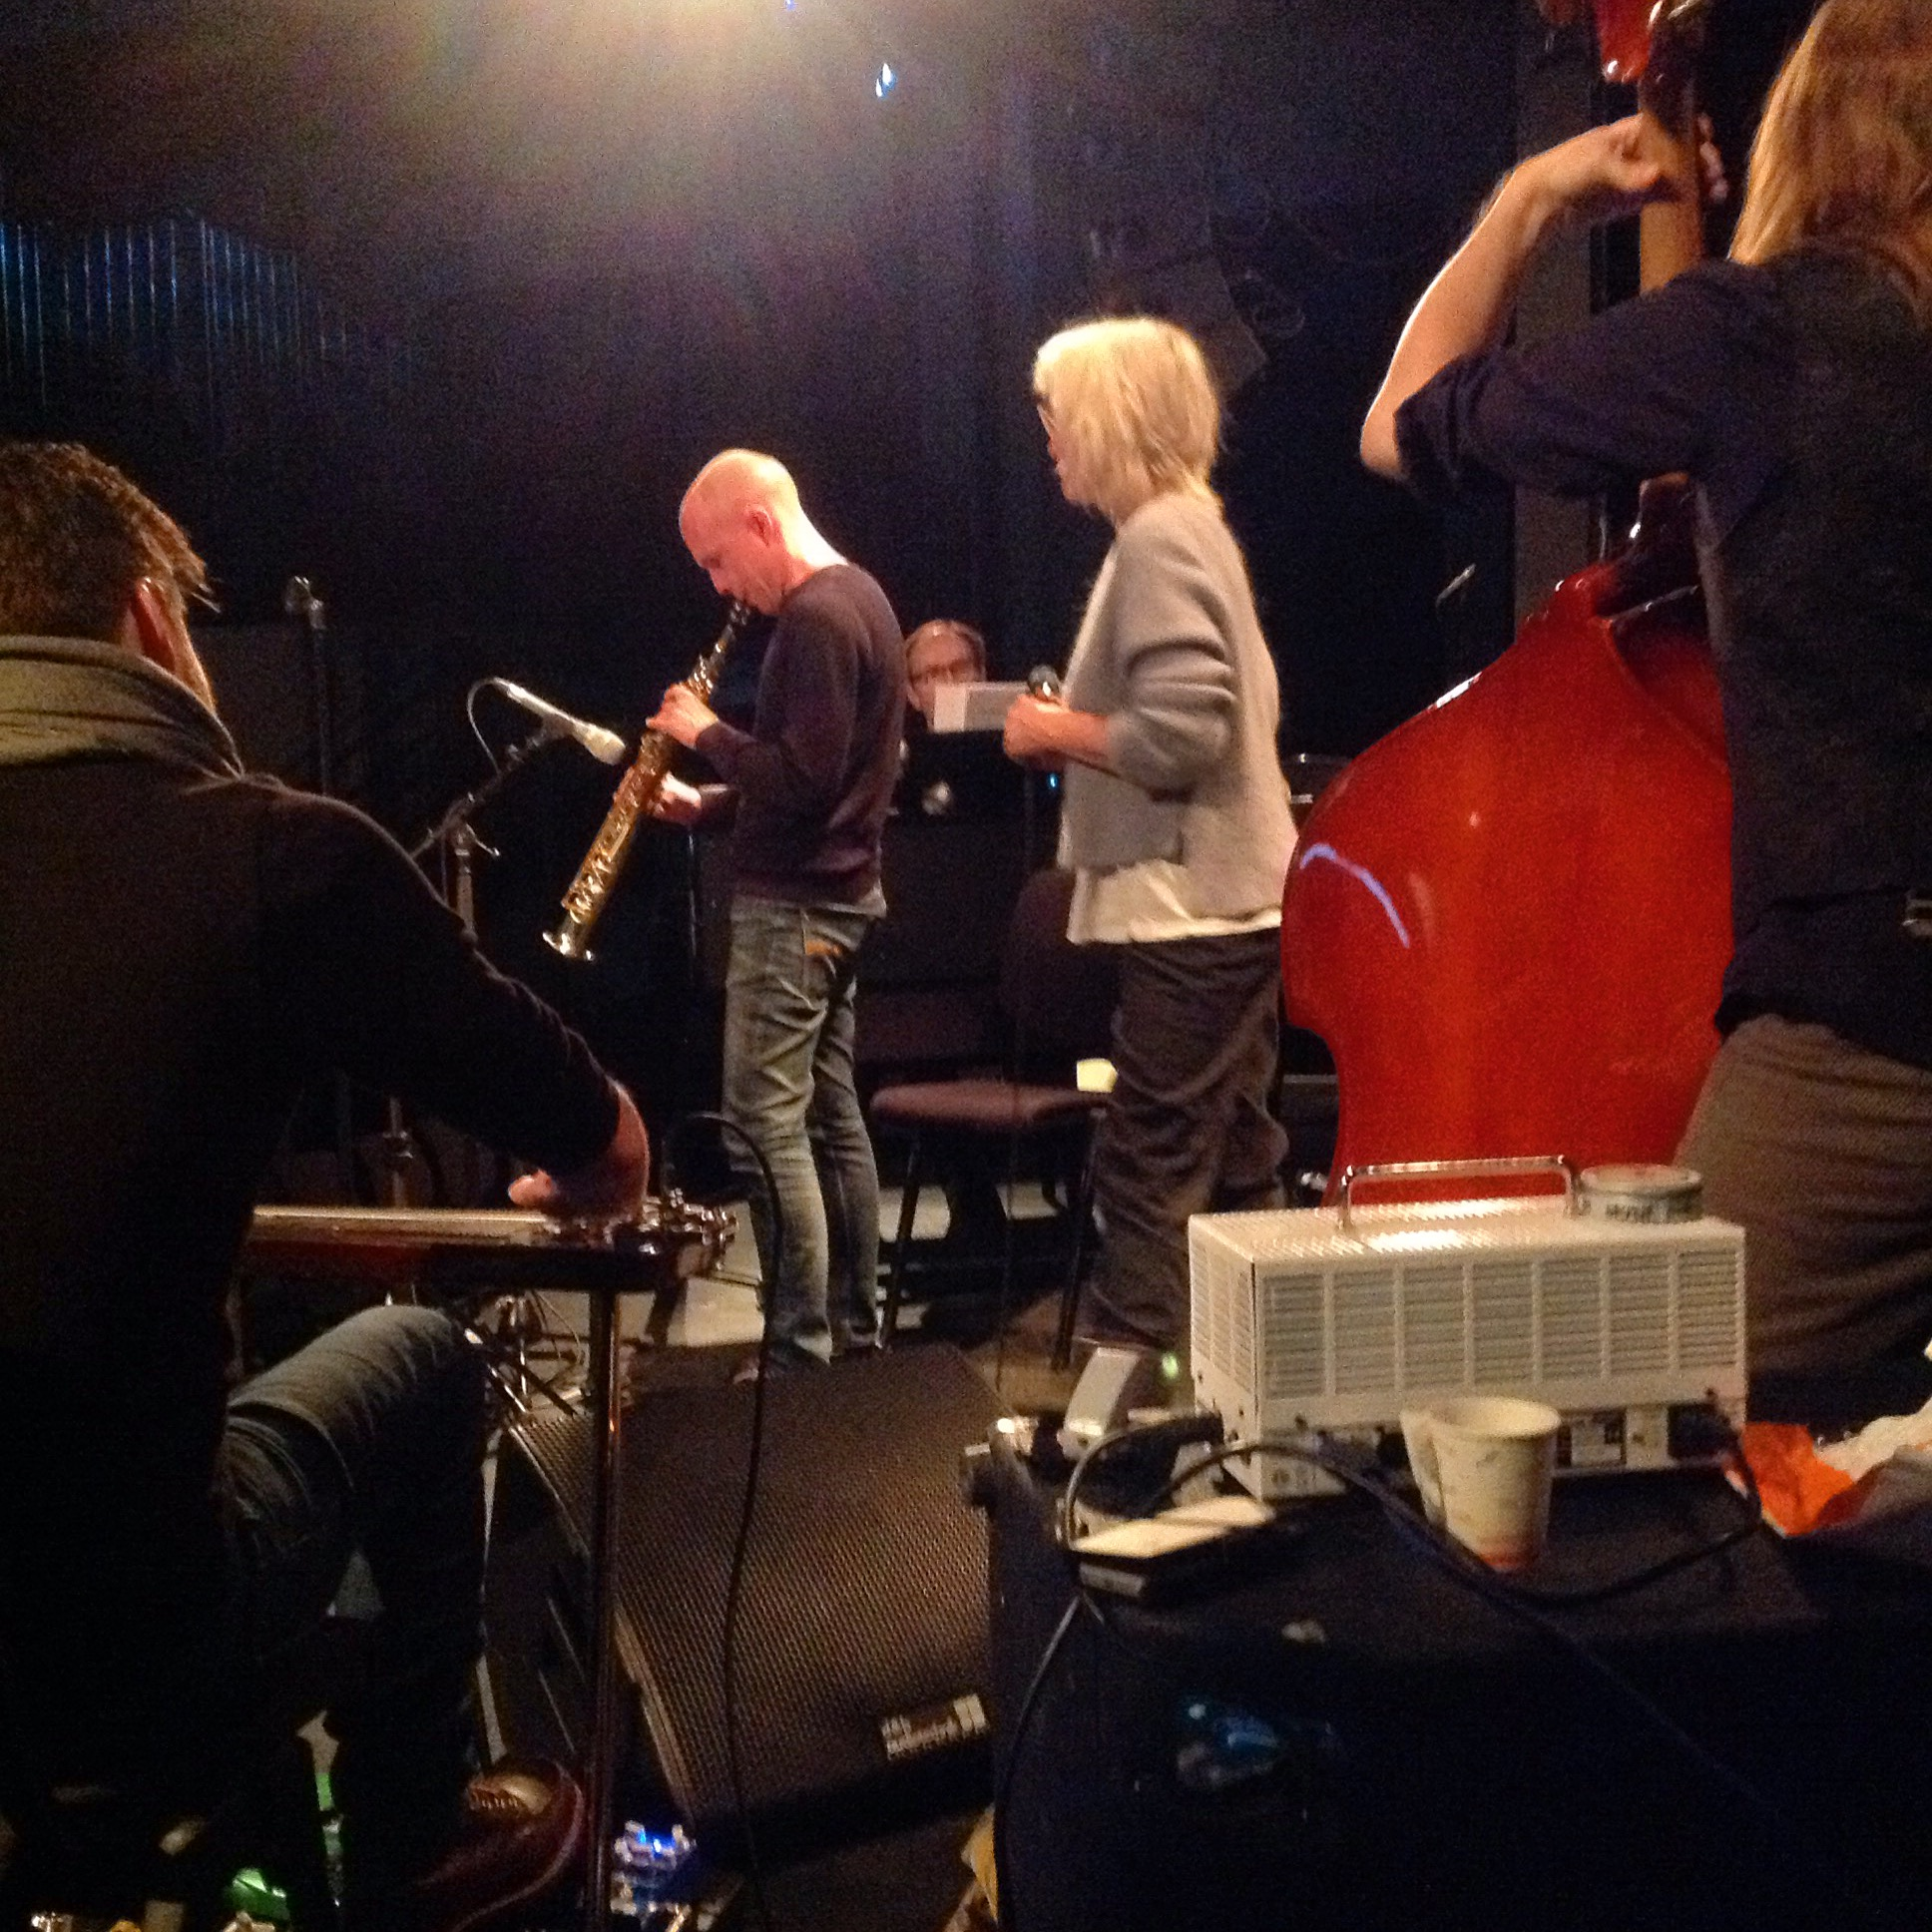 Tore Bruvoll, Frode Nymo, Bjørn Andor Drage, Marit Sandvik, Christo Stangness, Tobias Solheim- Nilssen